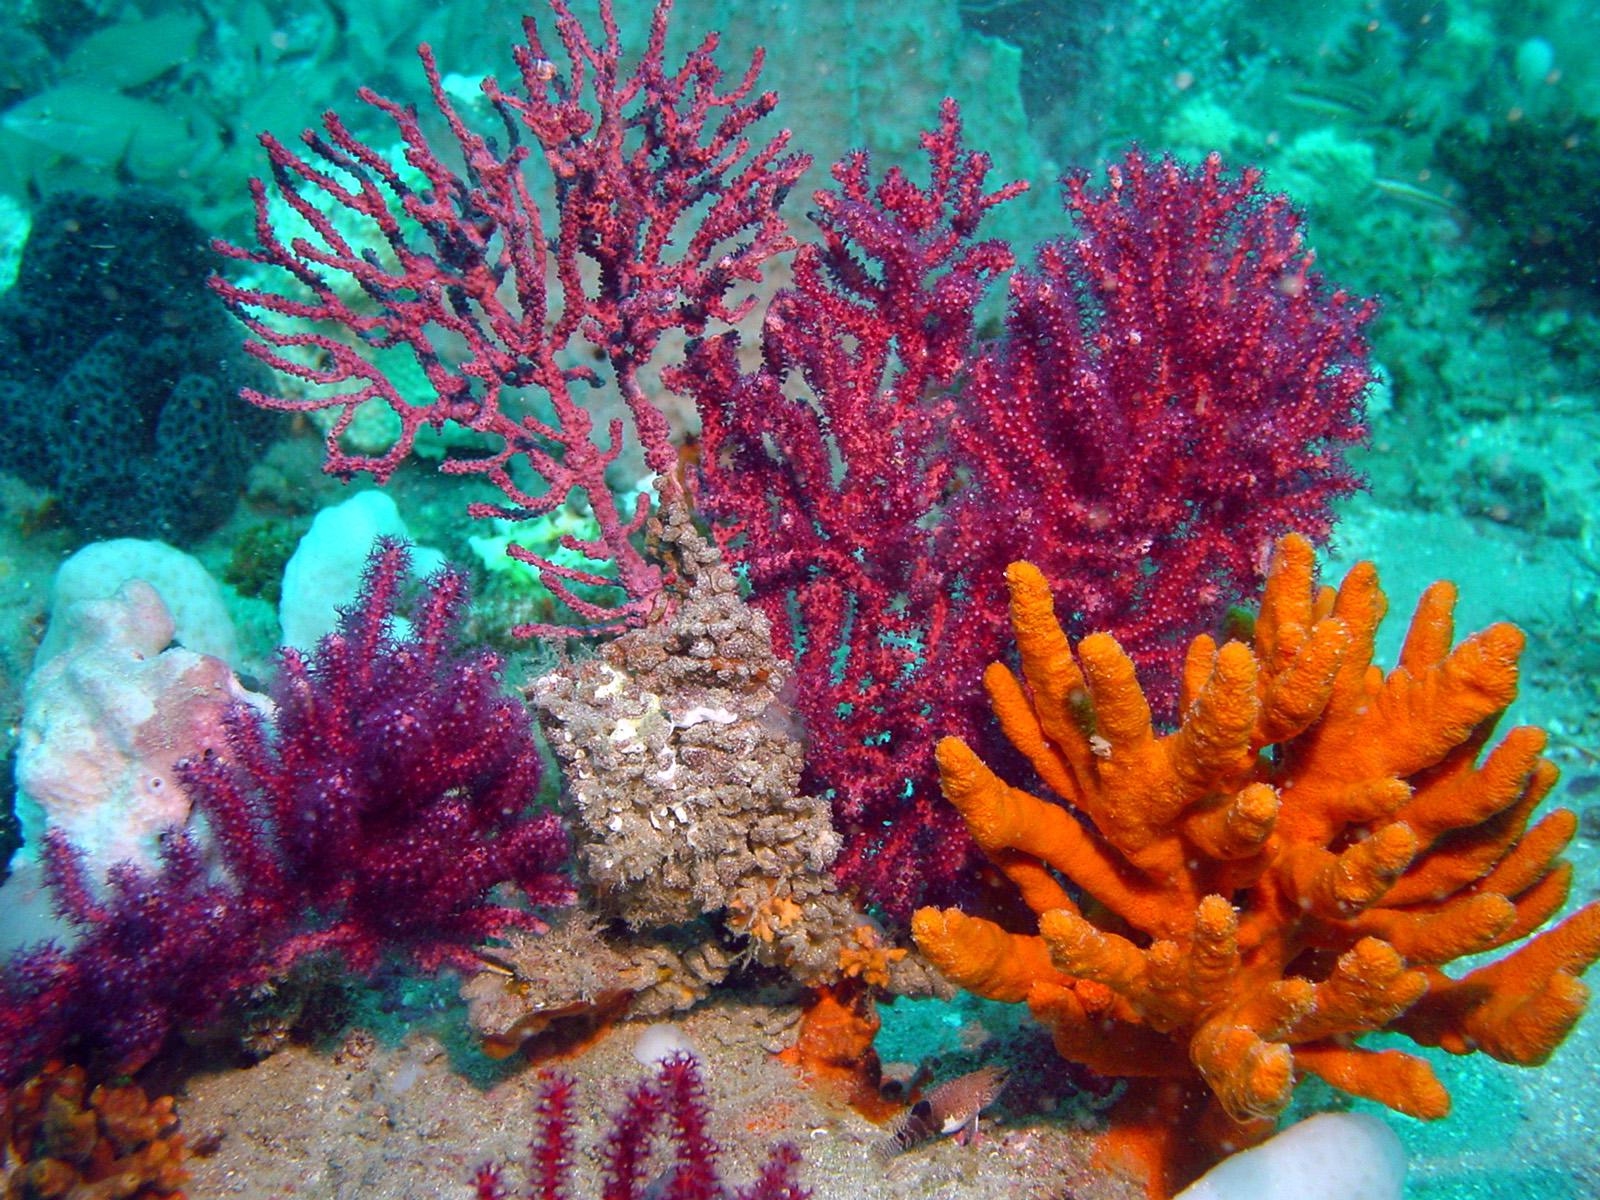 Upcoming Fishinars Lionfish South Atlantic States